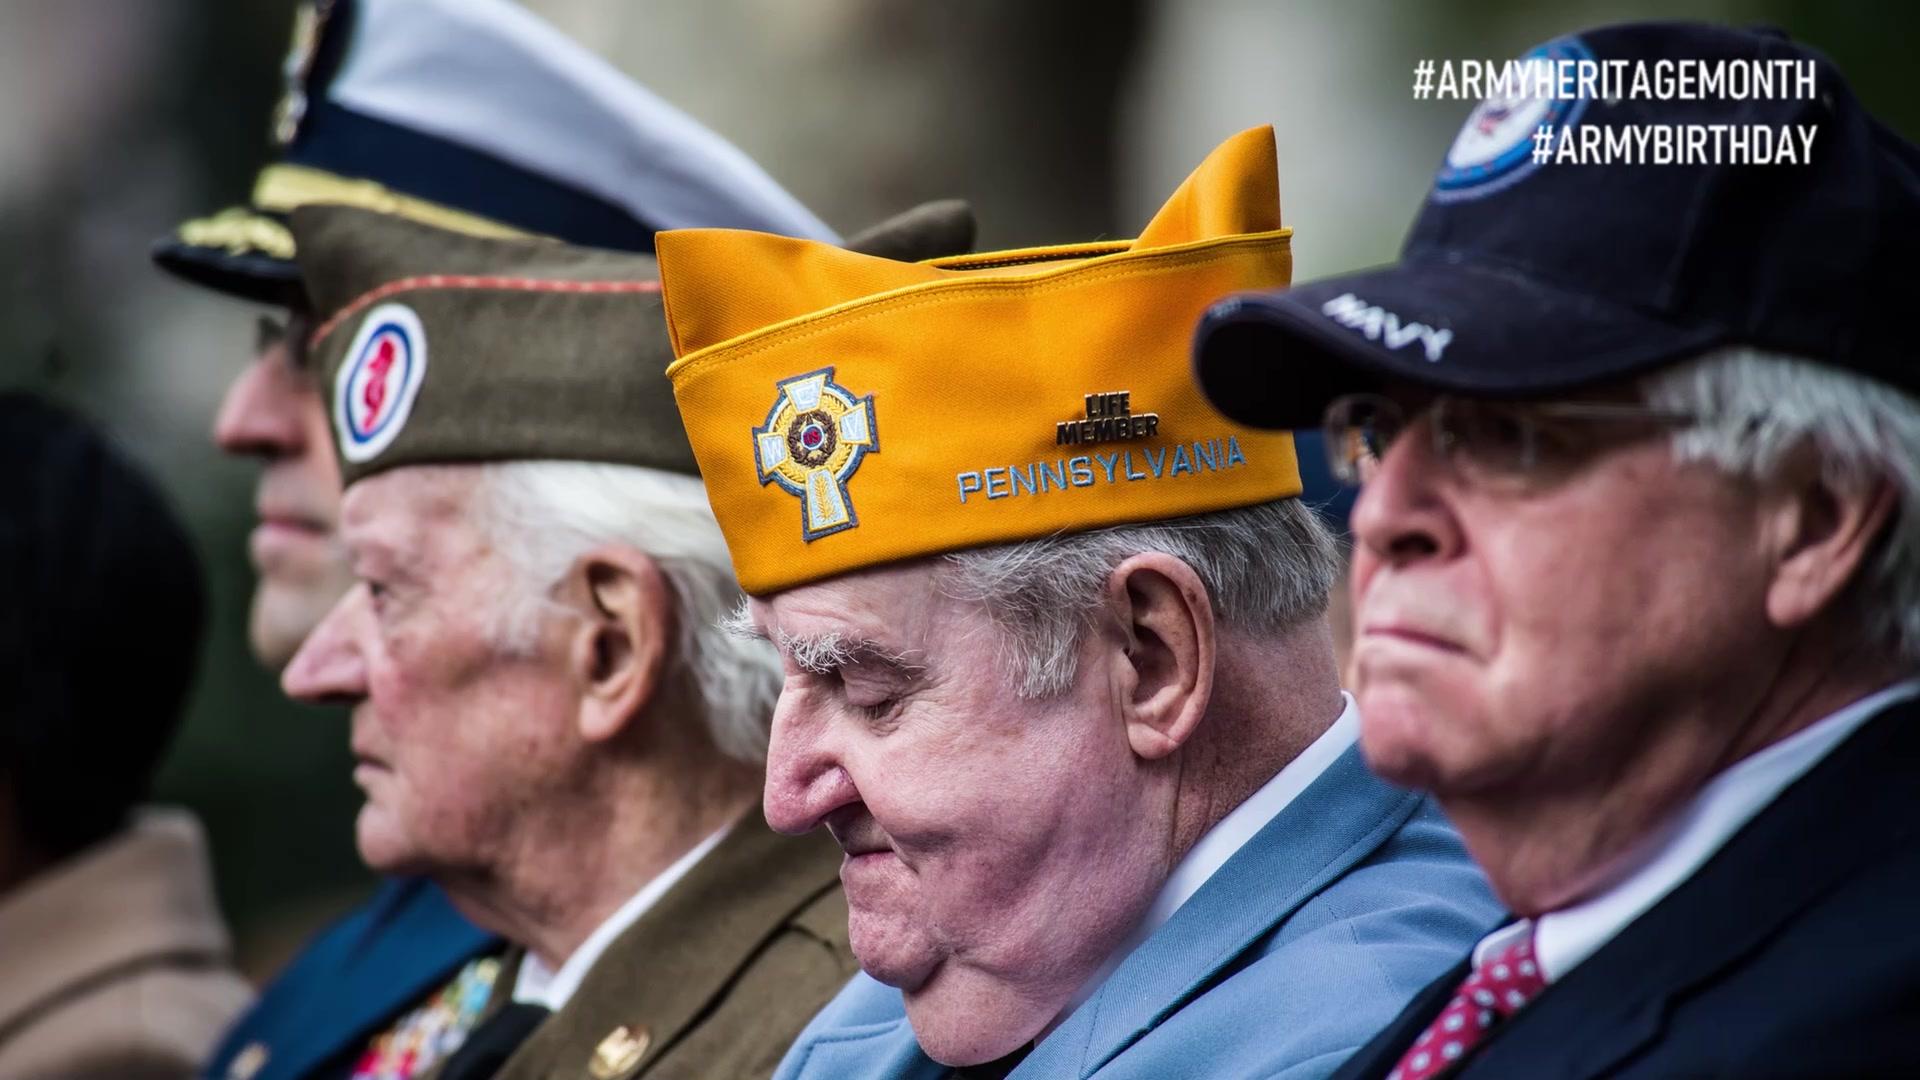 Col. Vance J. Klosinski, U.S. Army Garrison Rheinland-Pfalz commander, talks about Army Heritage Month 2021.